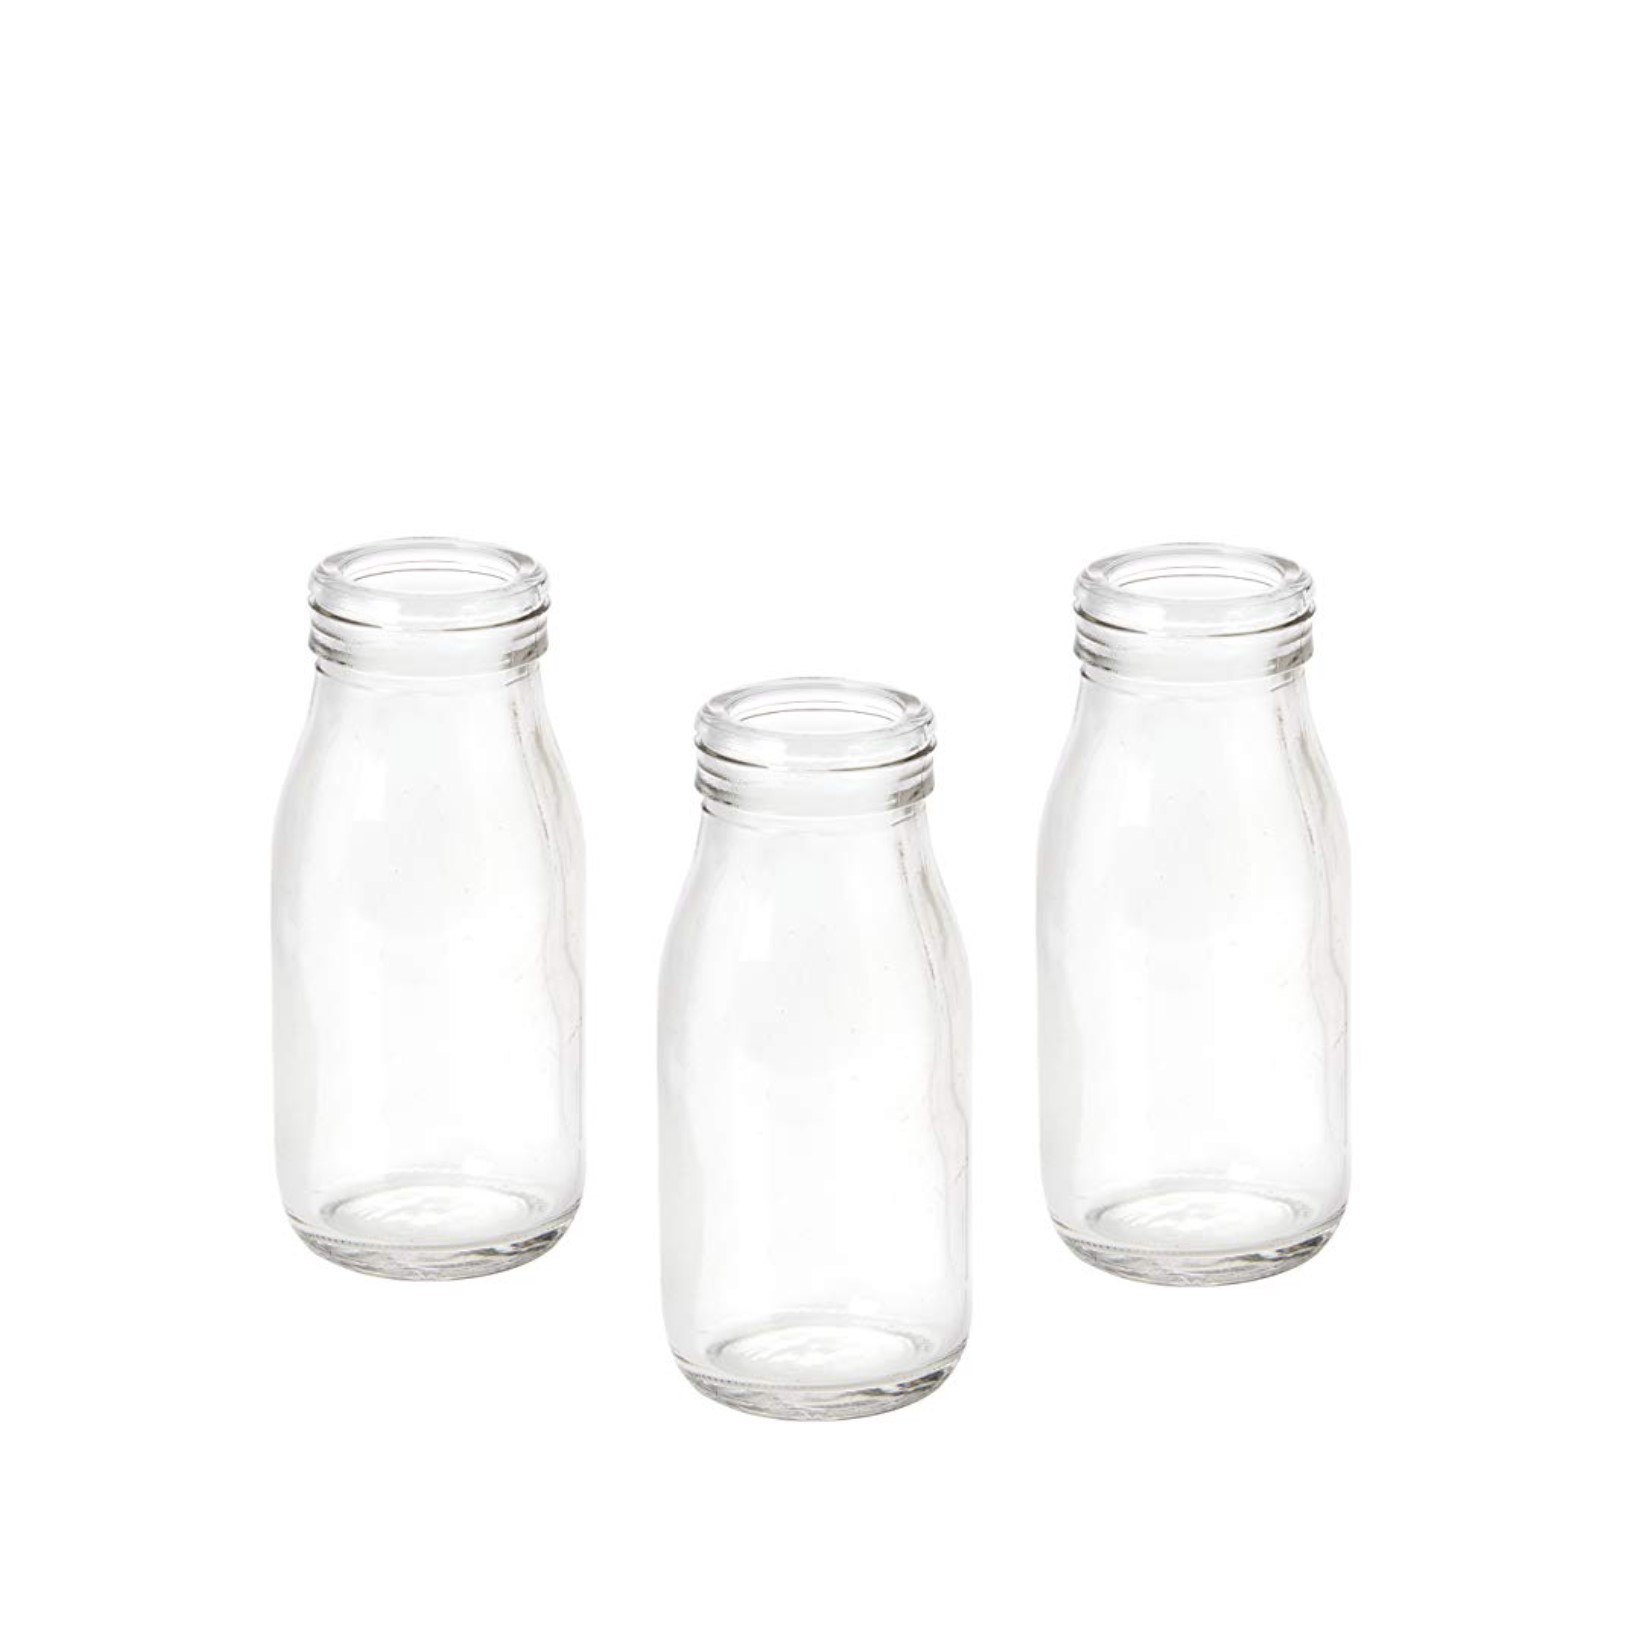 MINI GLASS MILK BOTTLES  14cm height approx